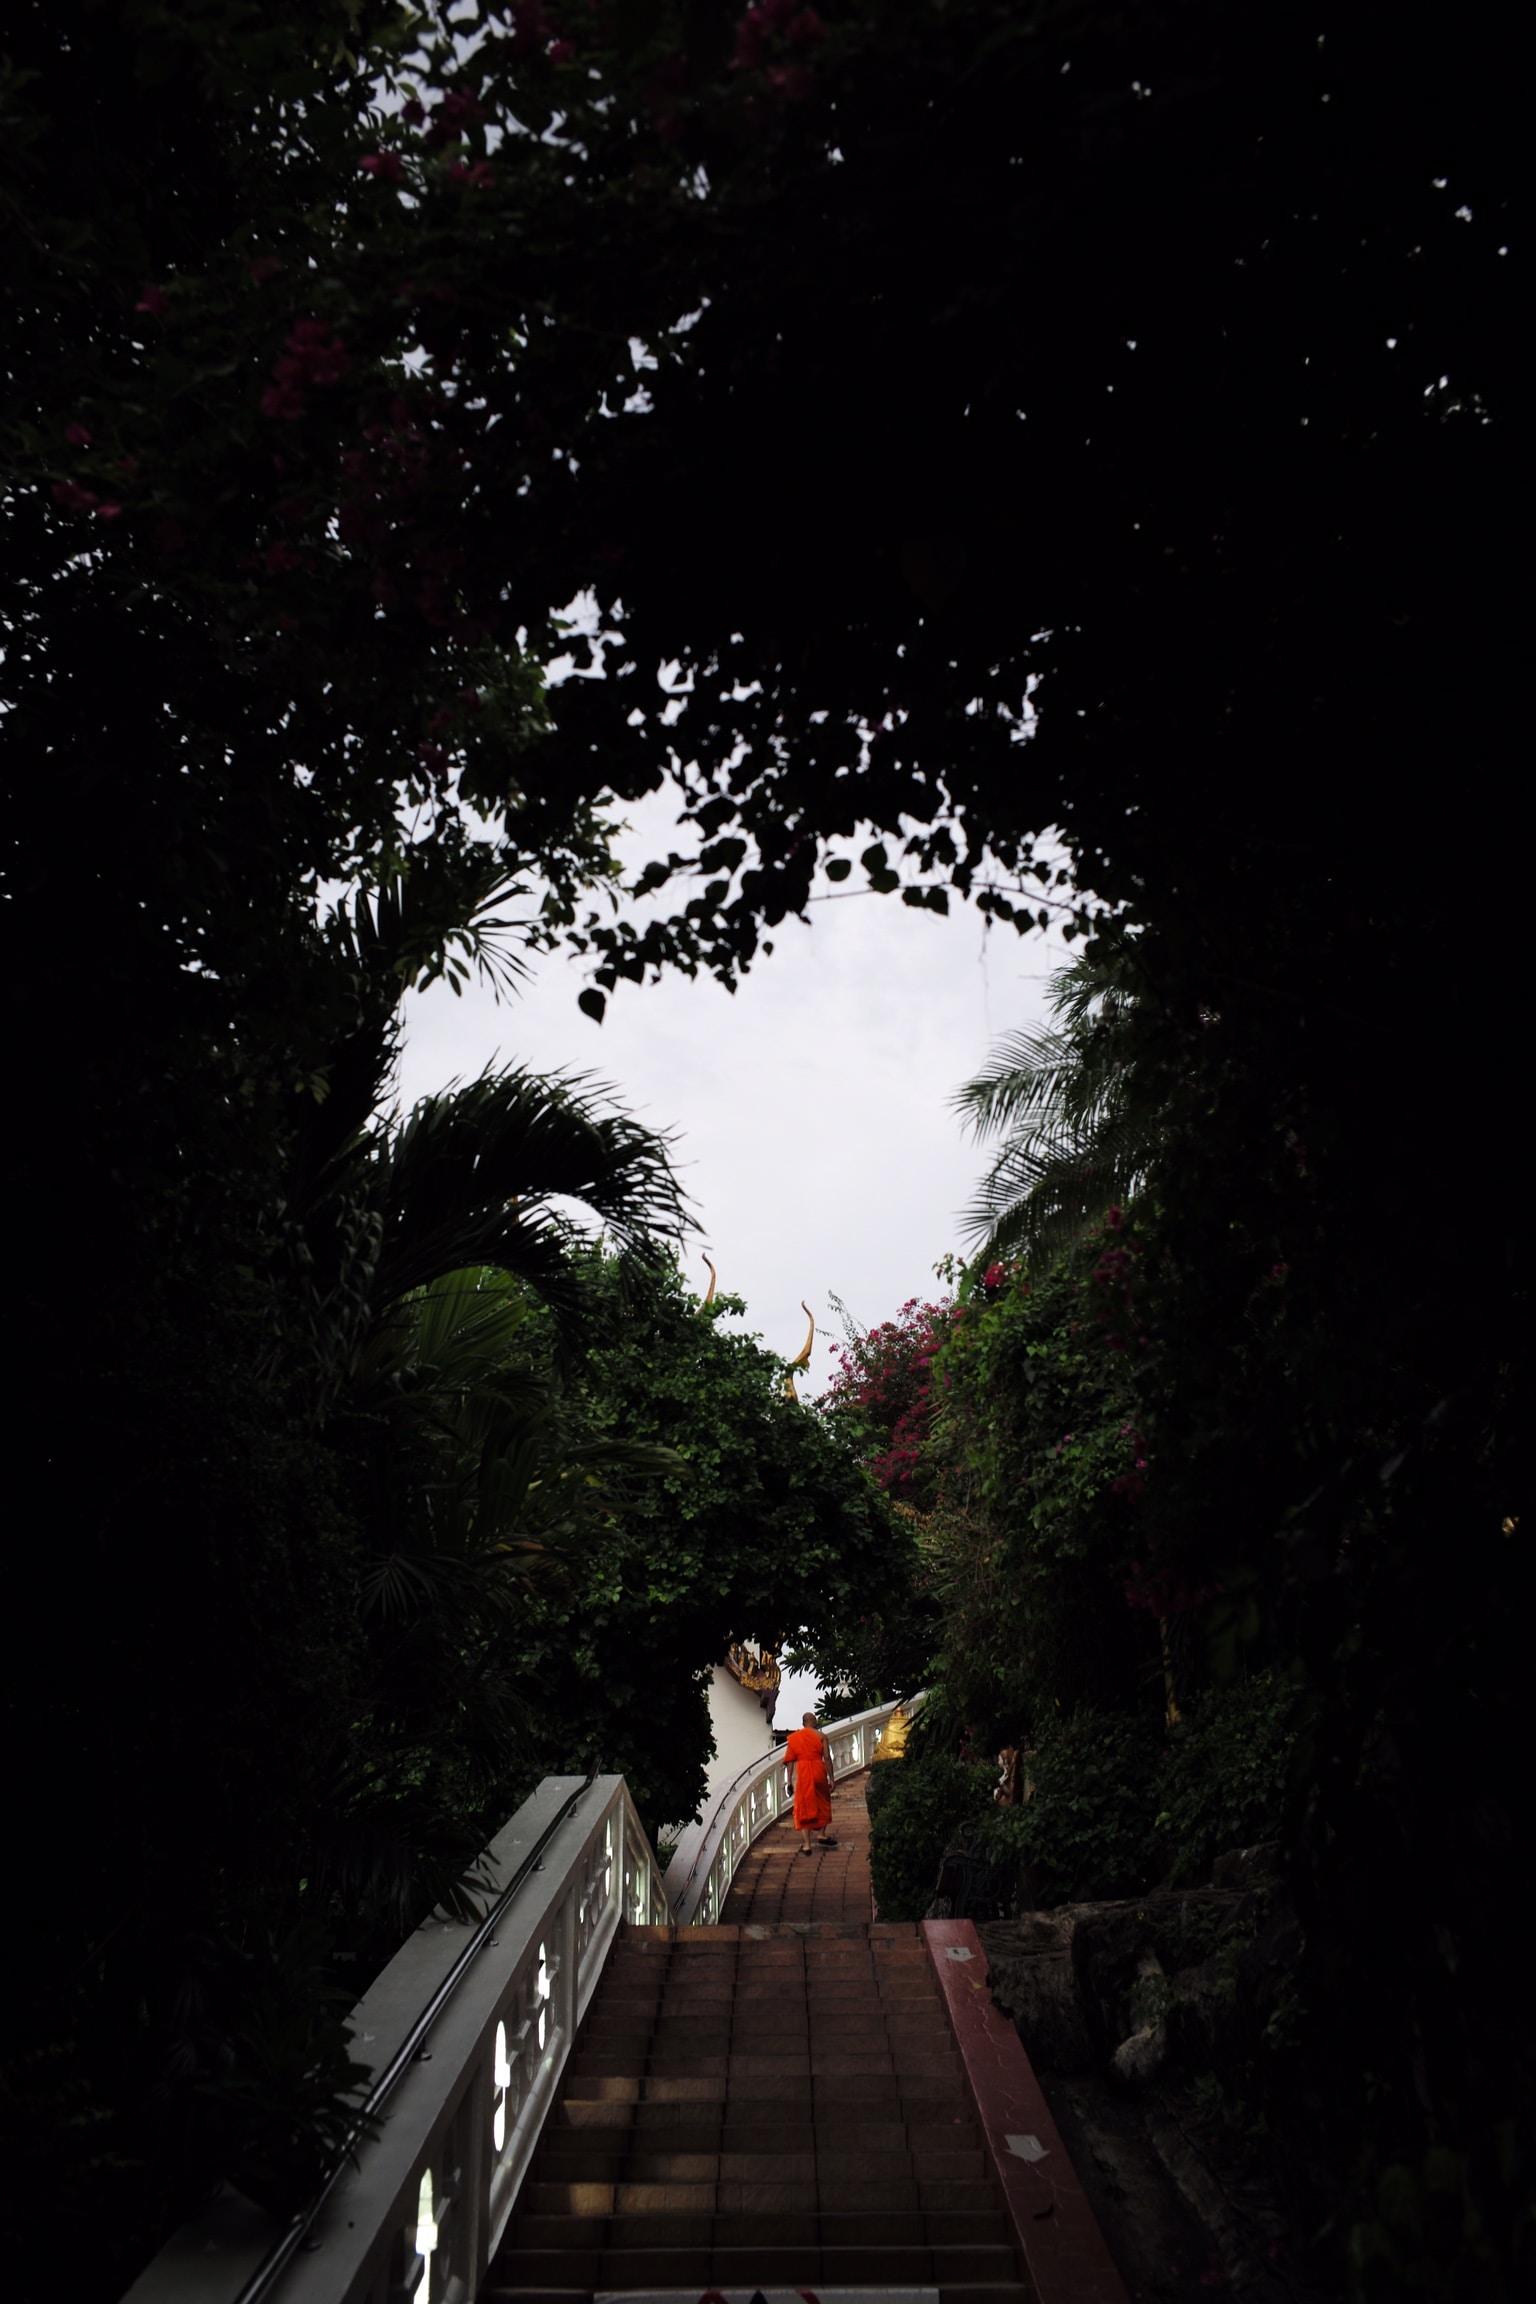 person walking on bridge in between trees at daytime